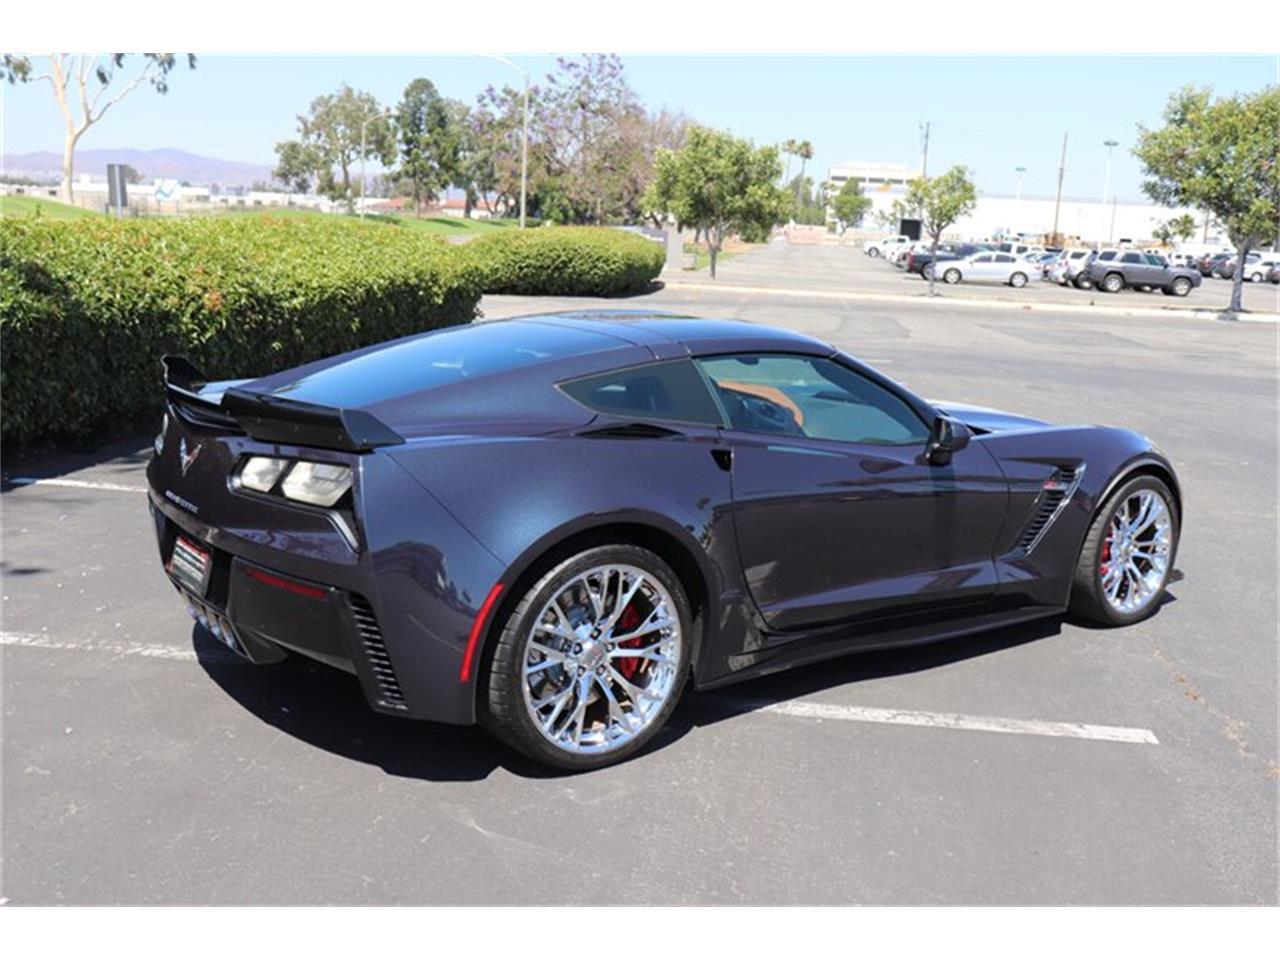 Large Picture of '15 Chevrolet Corvette Z06 located in California - QFLK